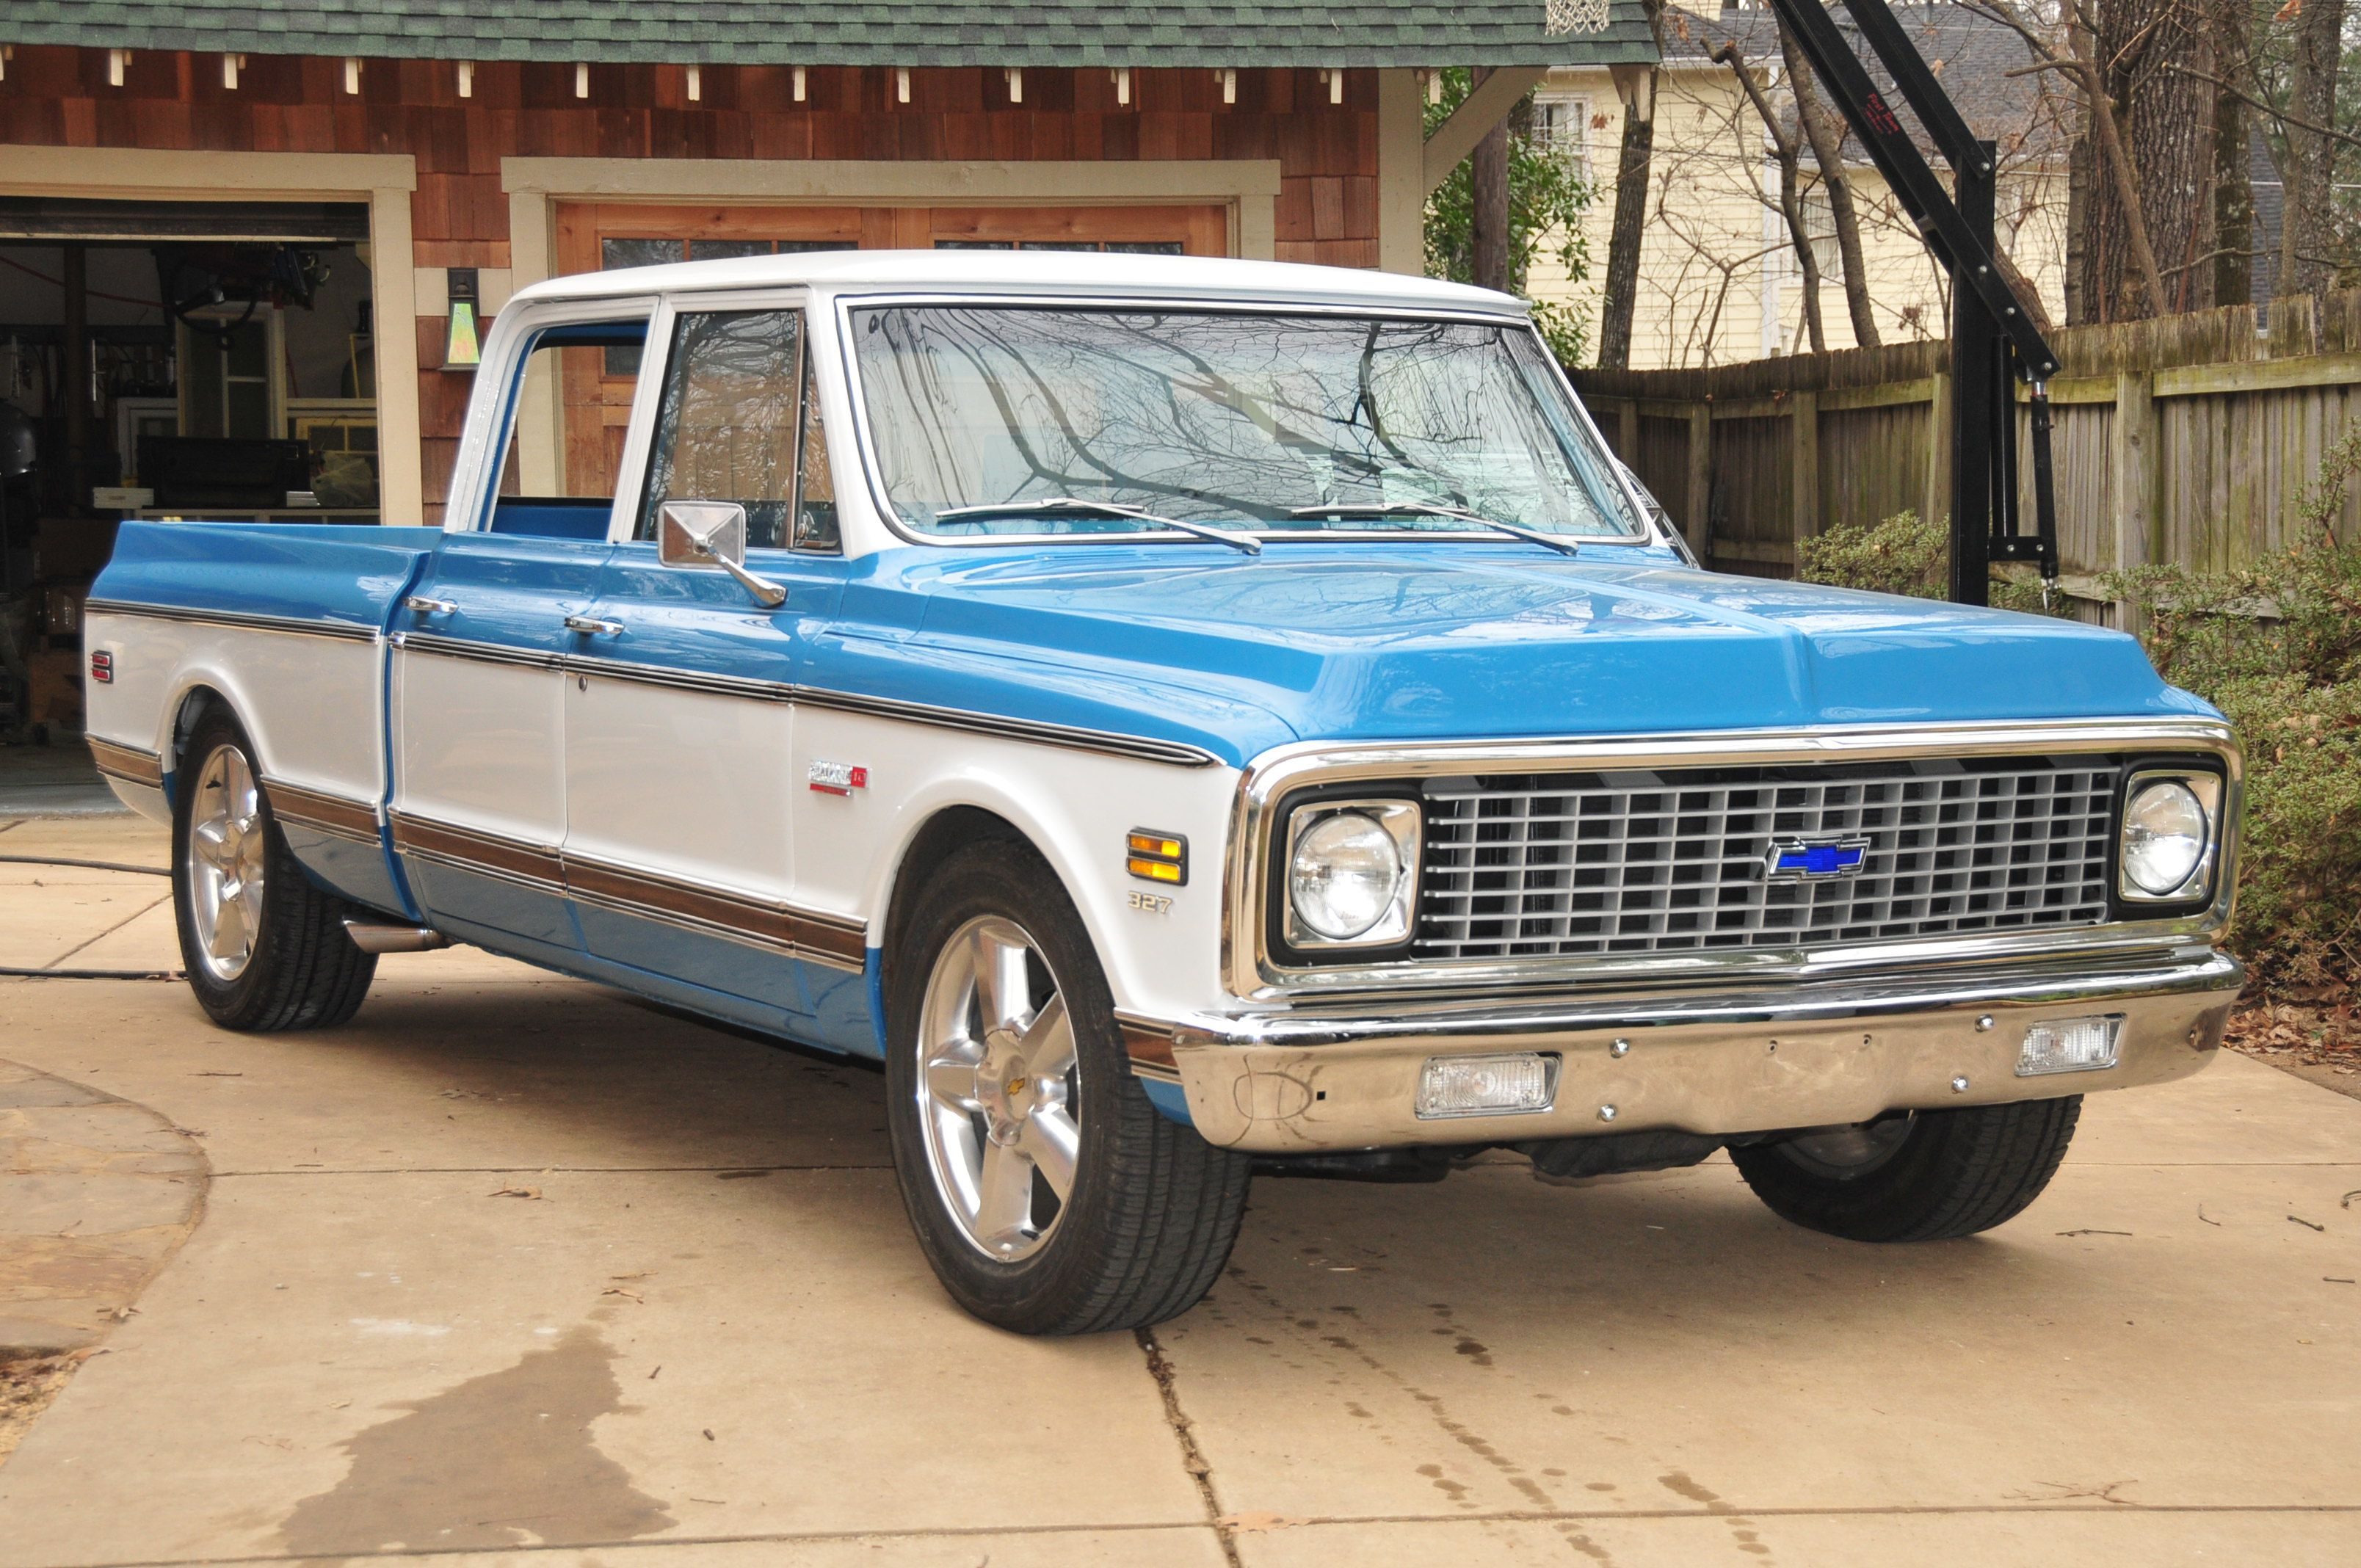 Best 1972 Chevrolet Crew Cab Ever Chevrolet Trucks Cool Trucks